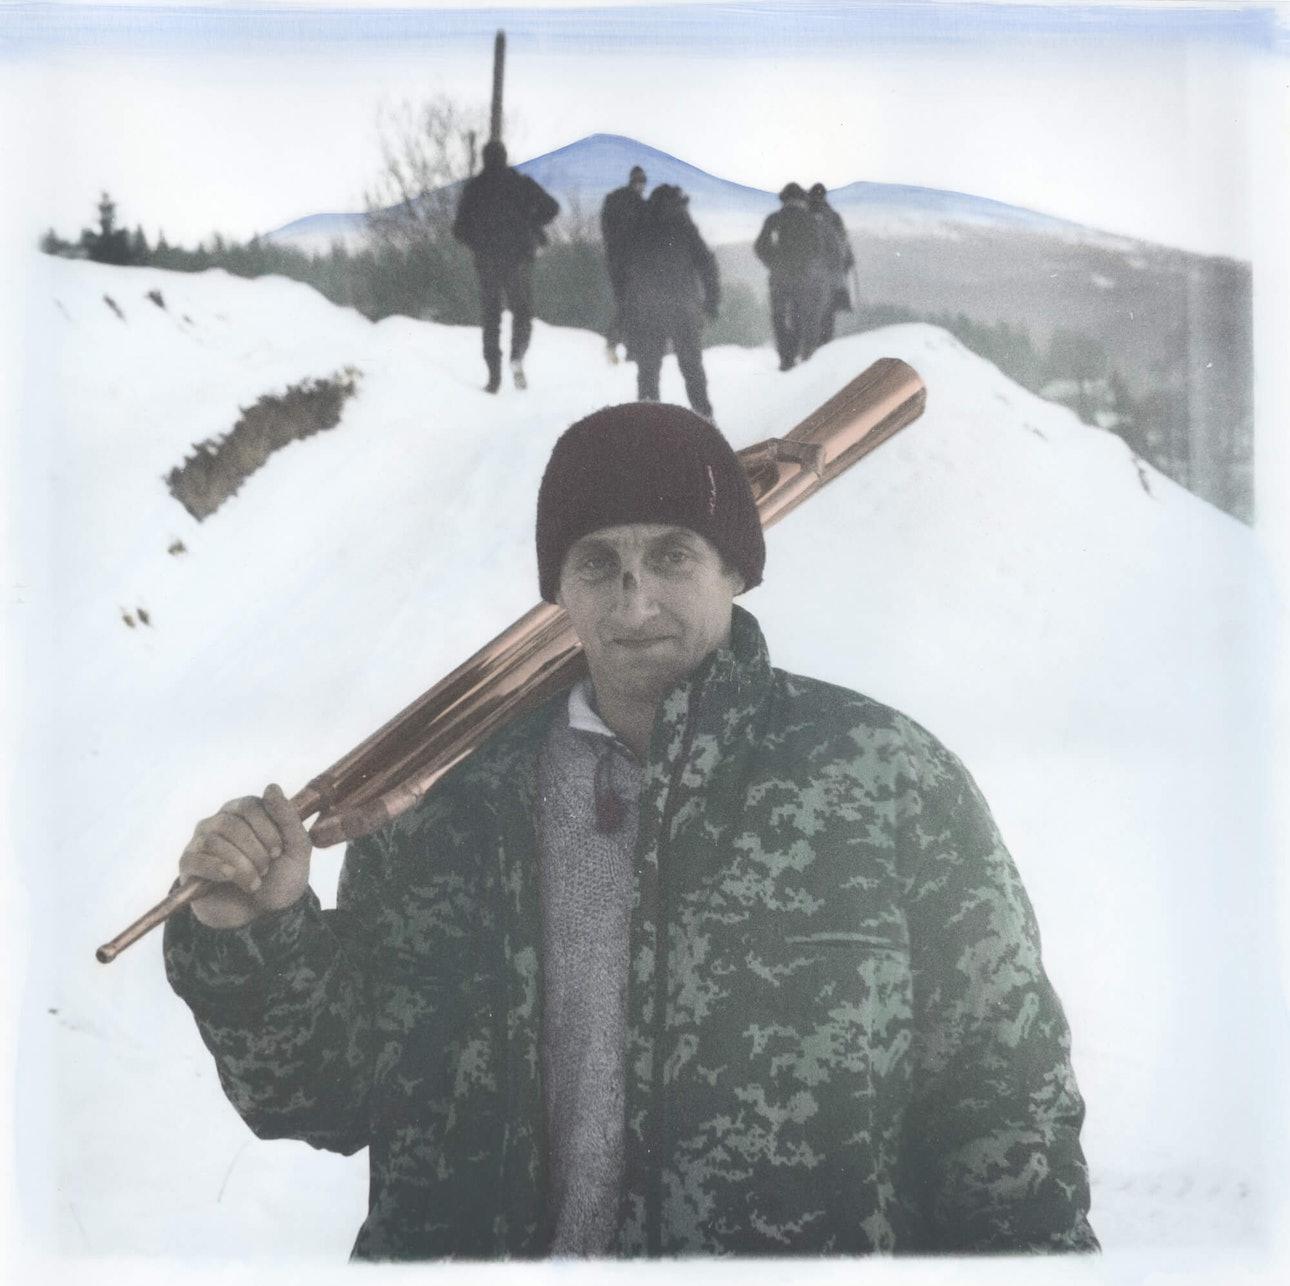 Dmytro_Kupriyan_17_-_A_man_with_trembita_from_a_Christmas_carol_band